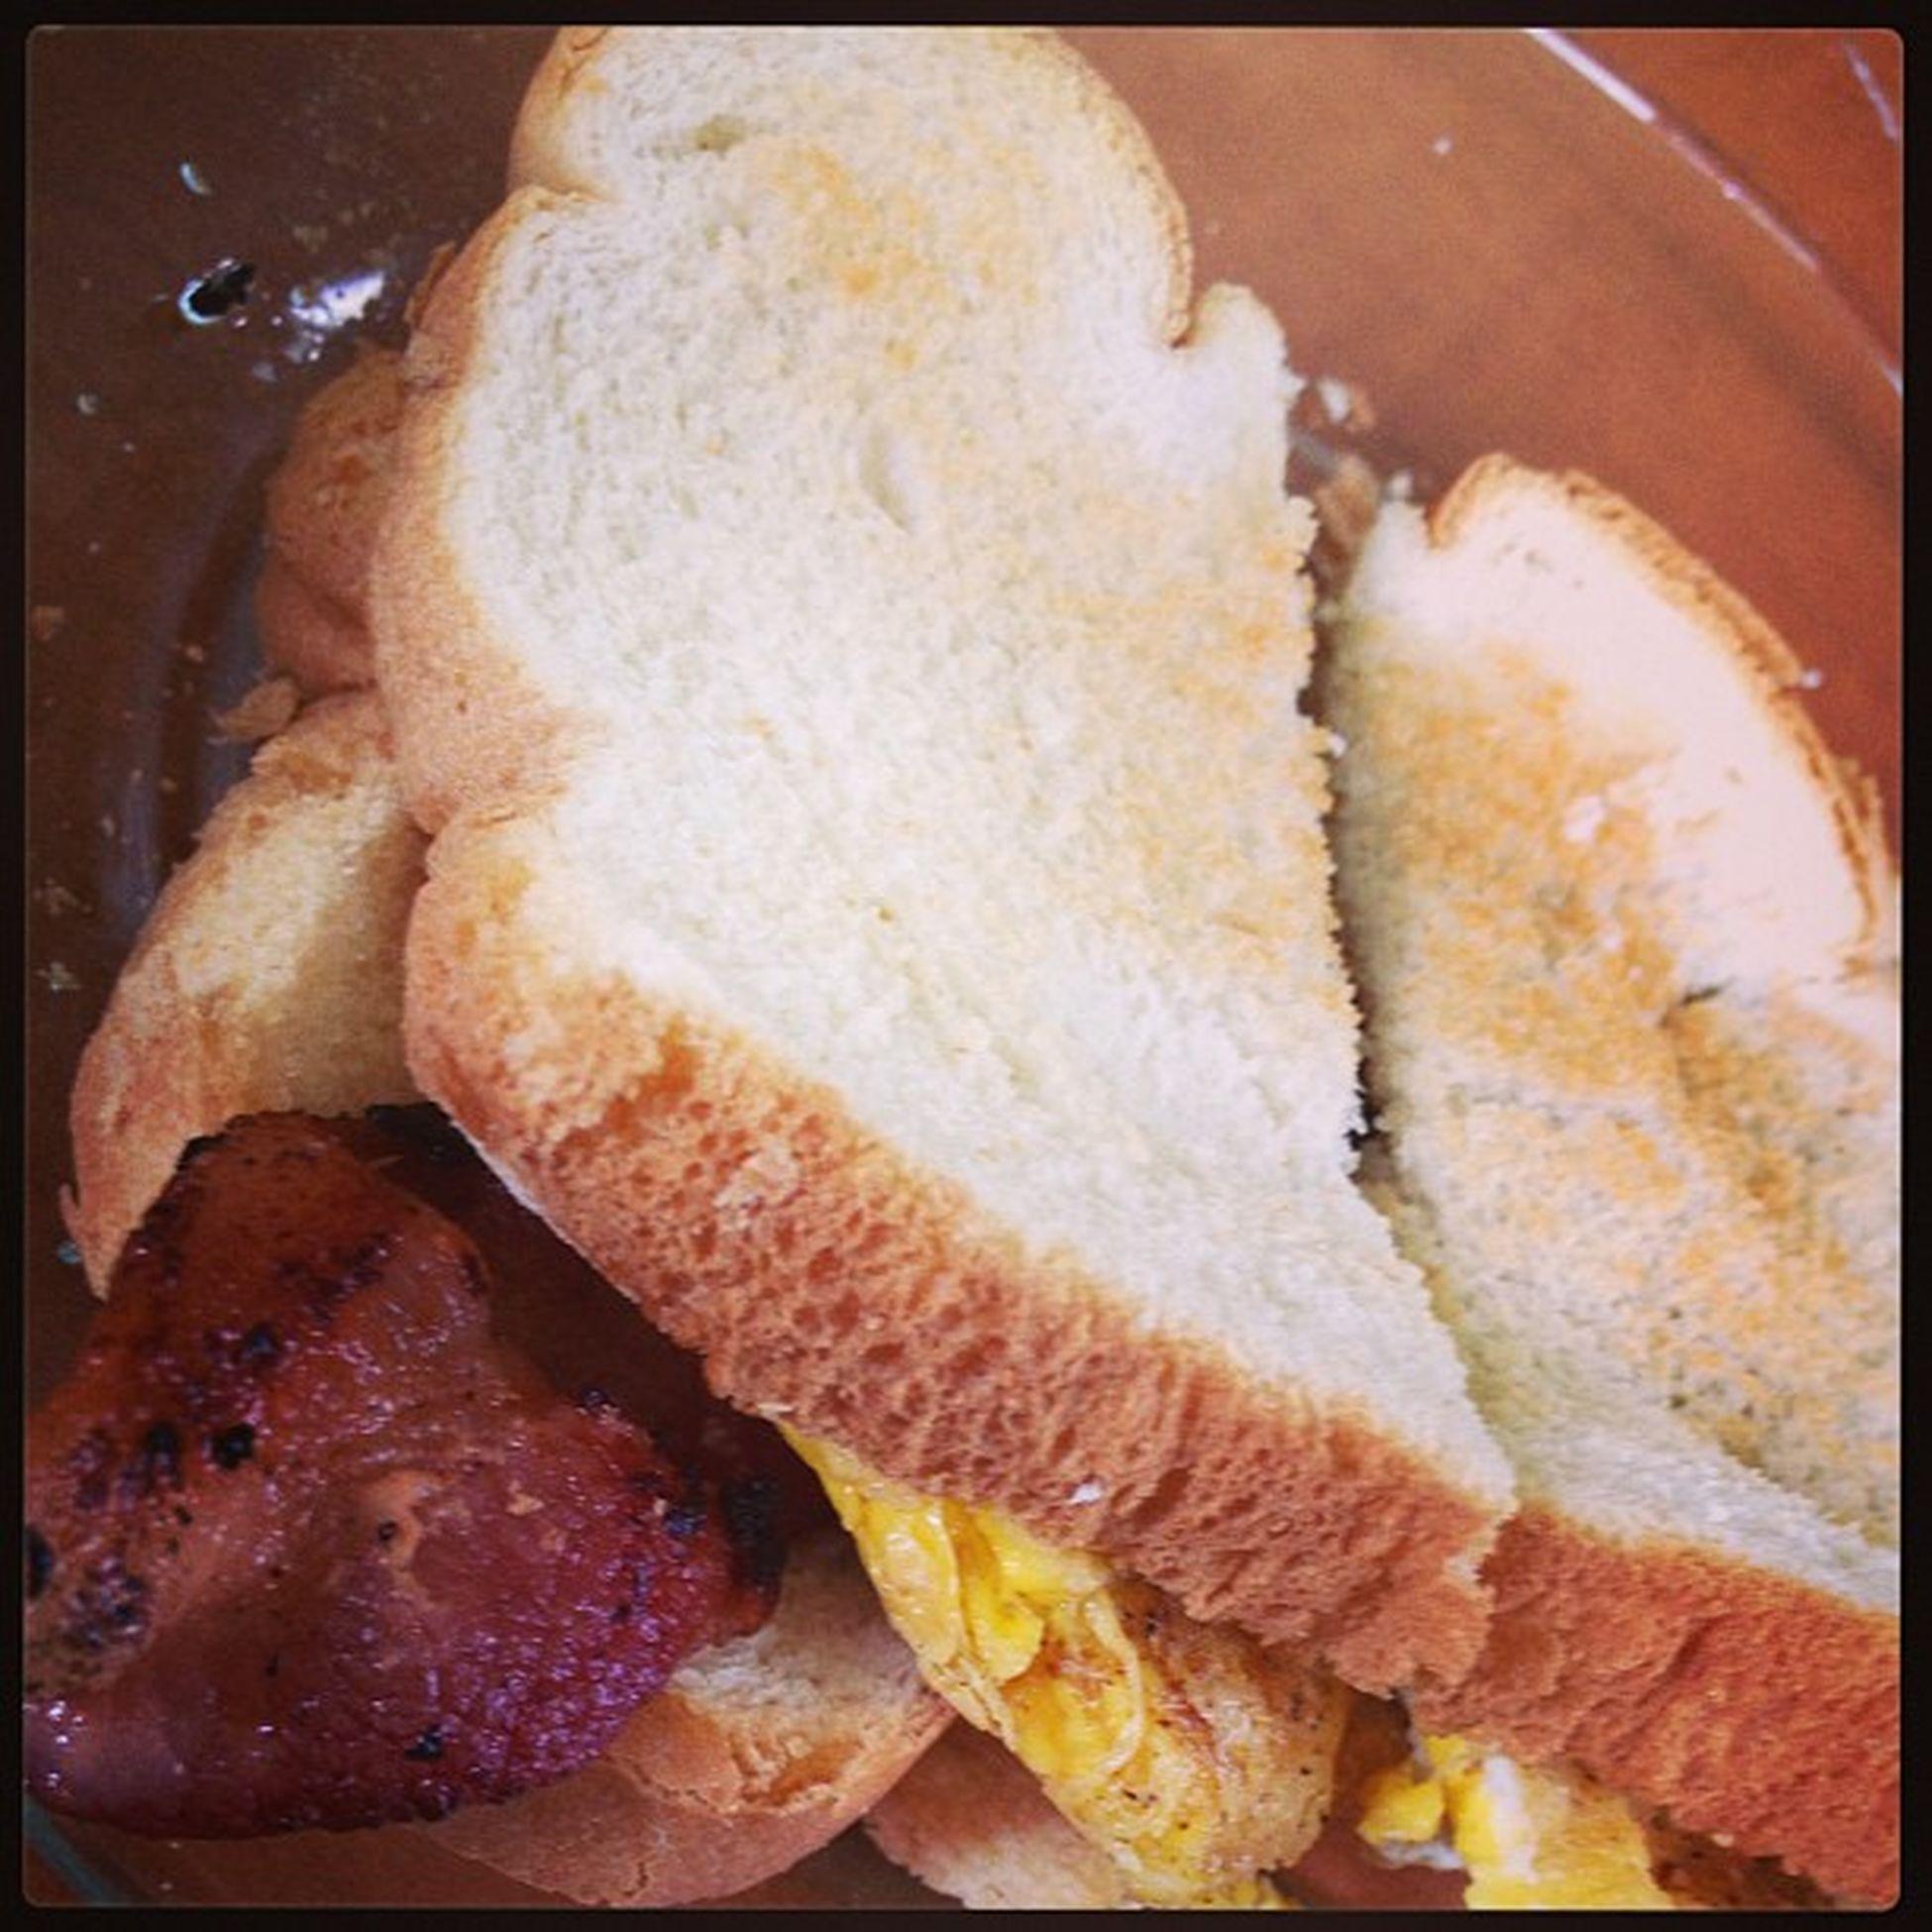 Baconeggsandwhich Selfmade Breakfast Toasted tastesamazing ill